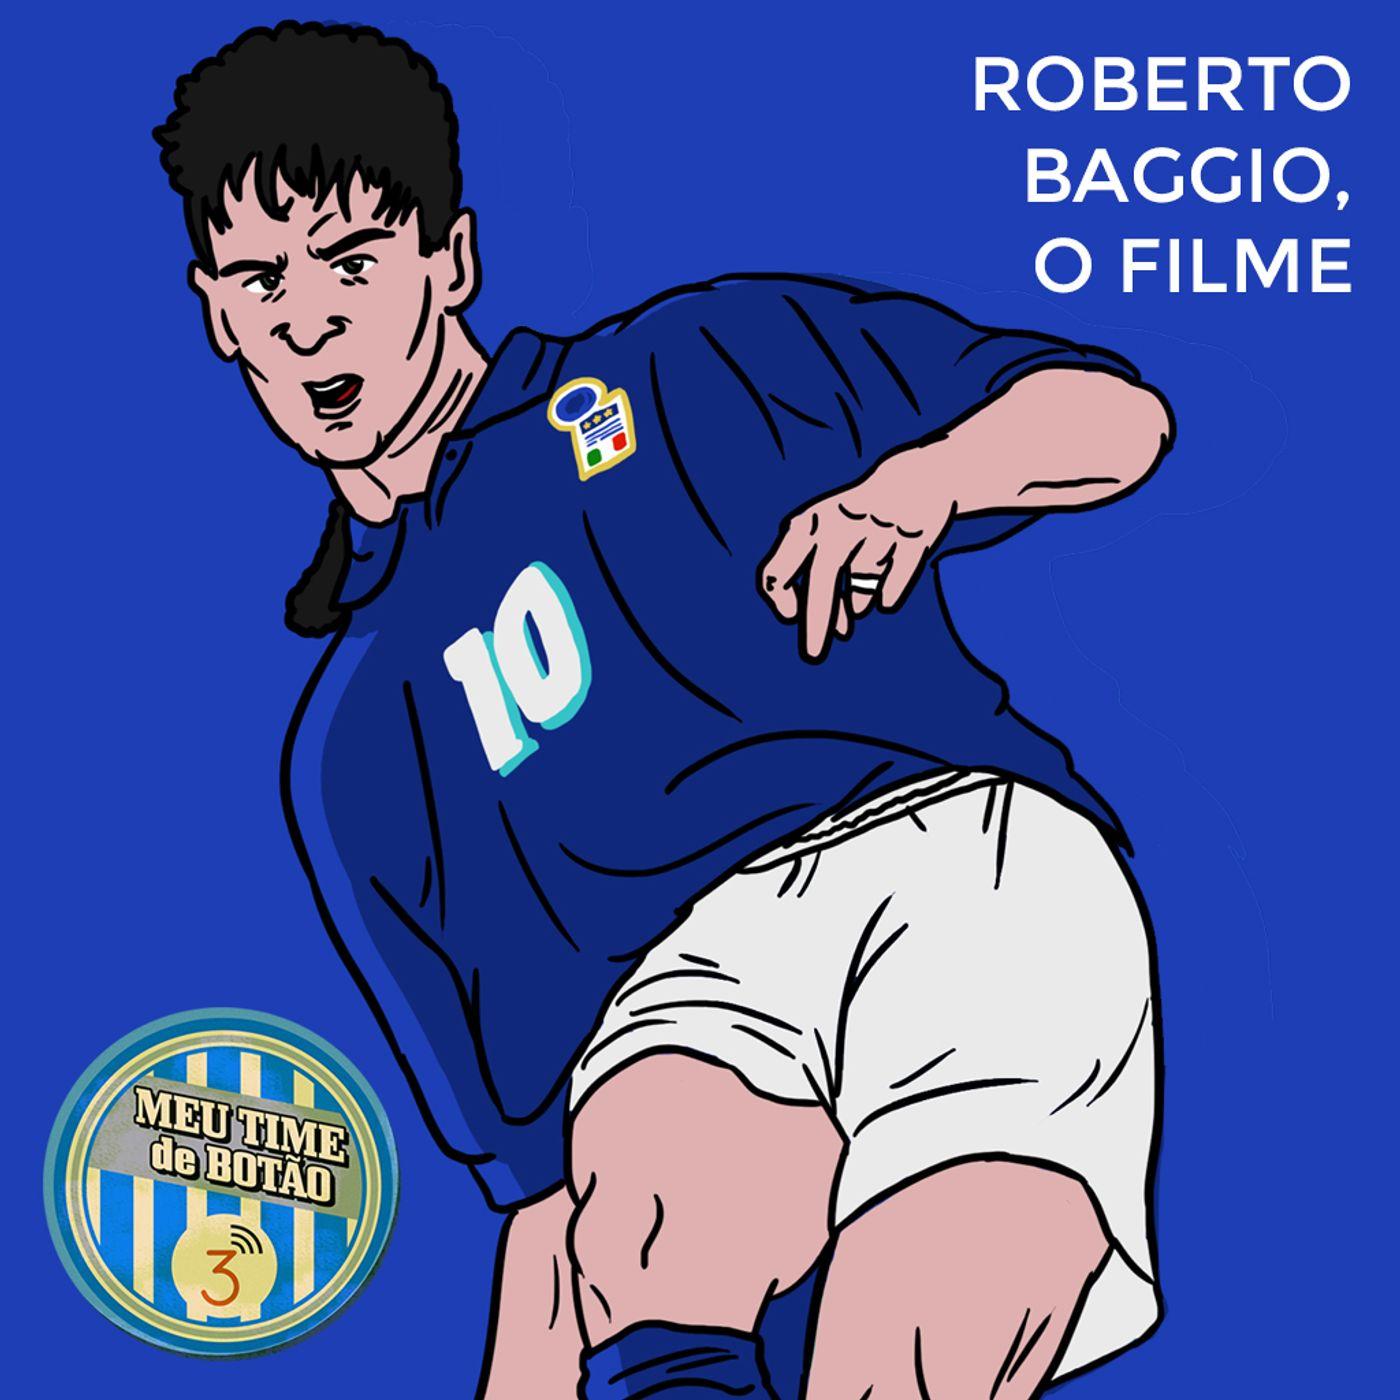 Botão #233 Roberto Baggio